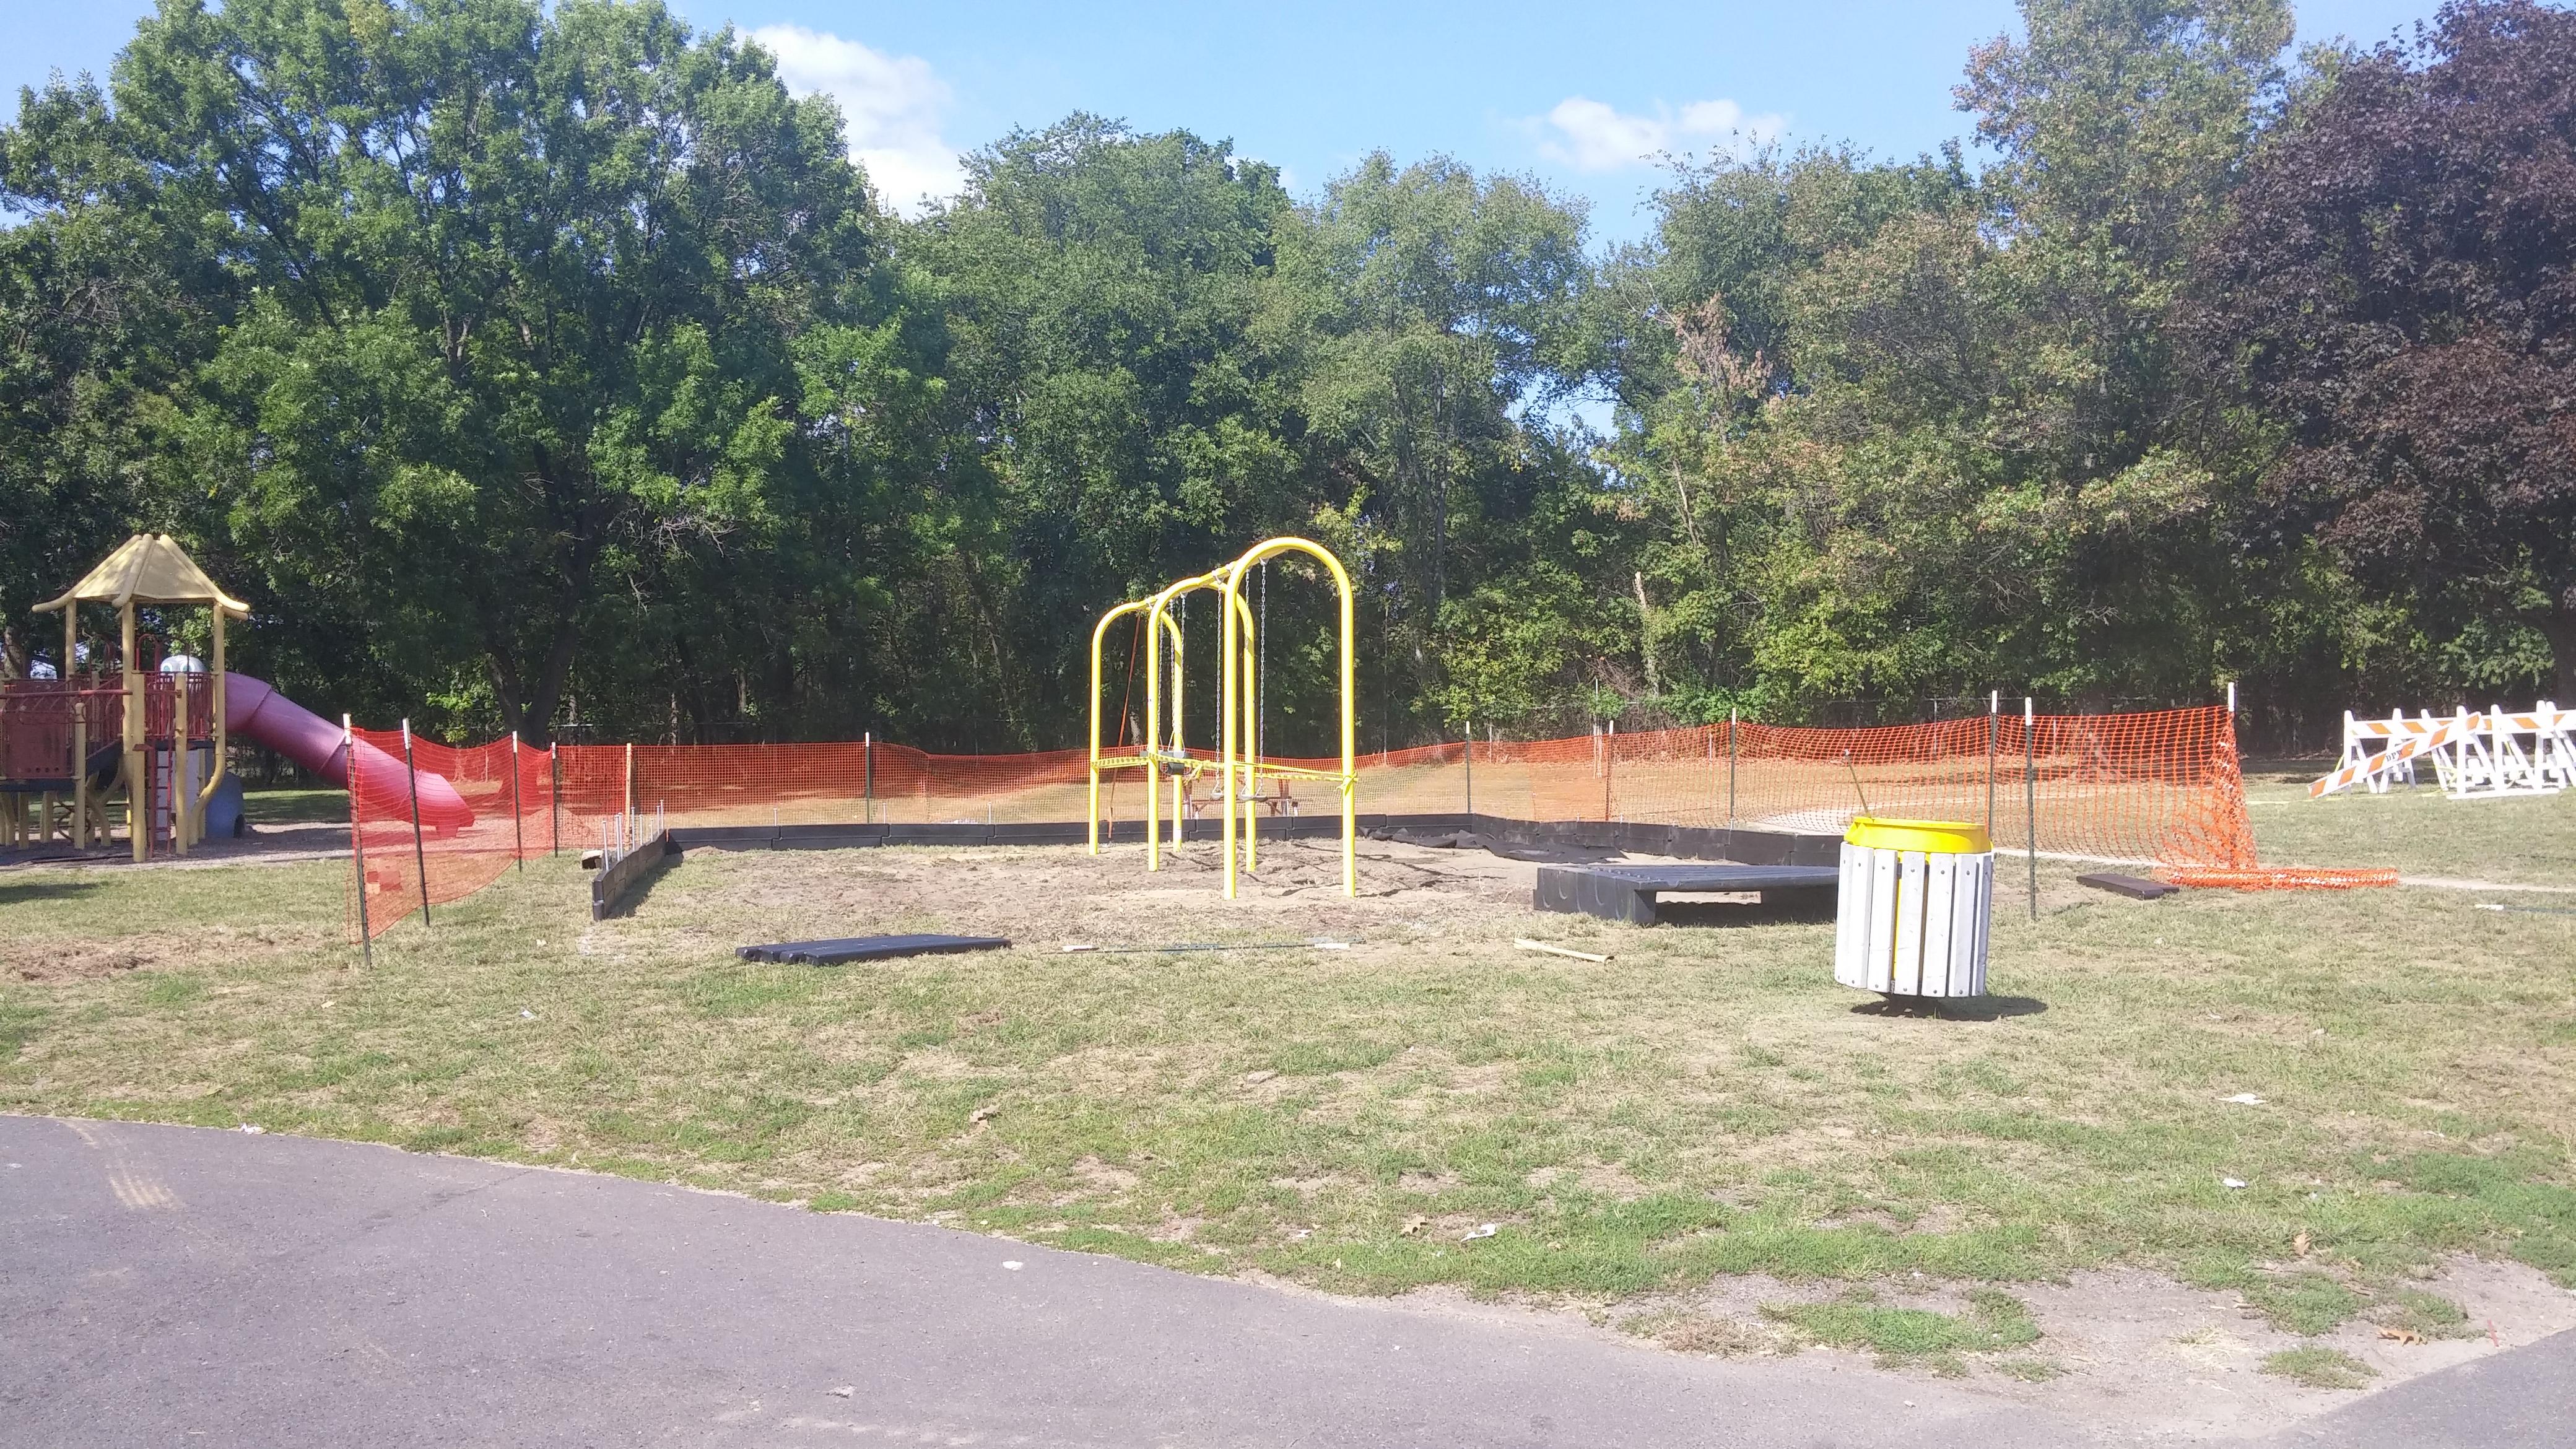 New Swing Set Installation Starts Today Hurray Shapingnj